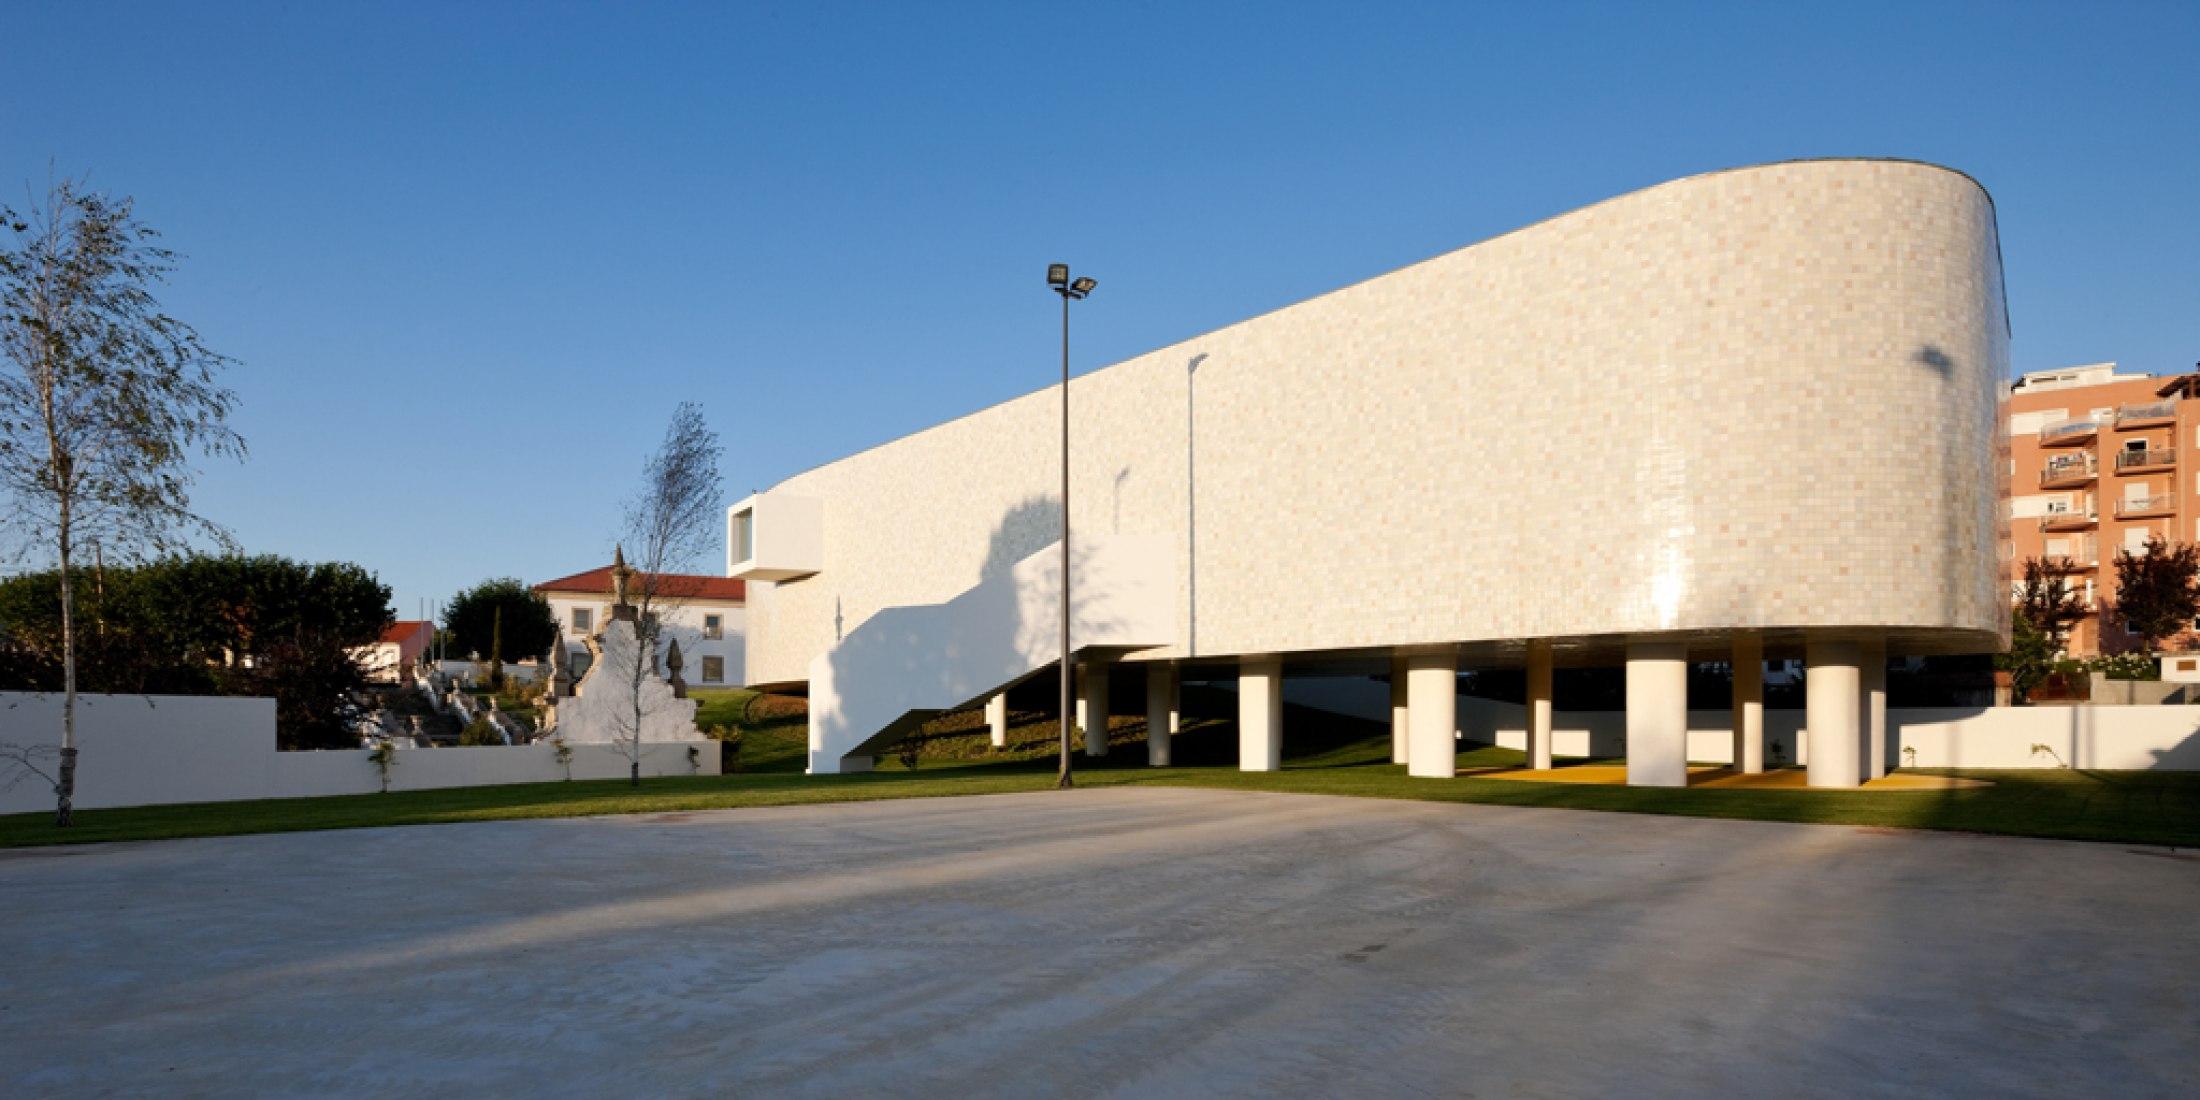 Outside view. Combatentes Educational Center, by Cannatà & Fernandes arquitectos. Photography © Luis Ferreira Alves.